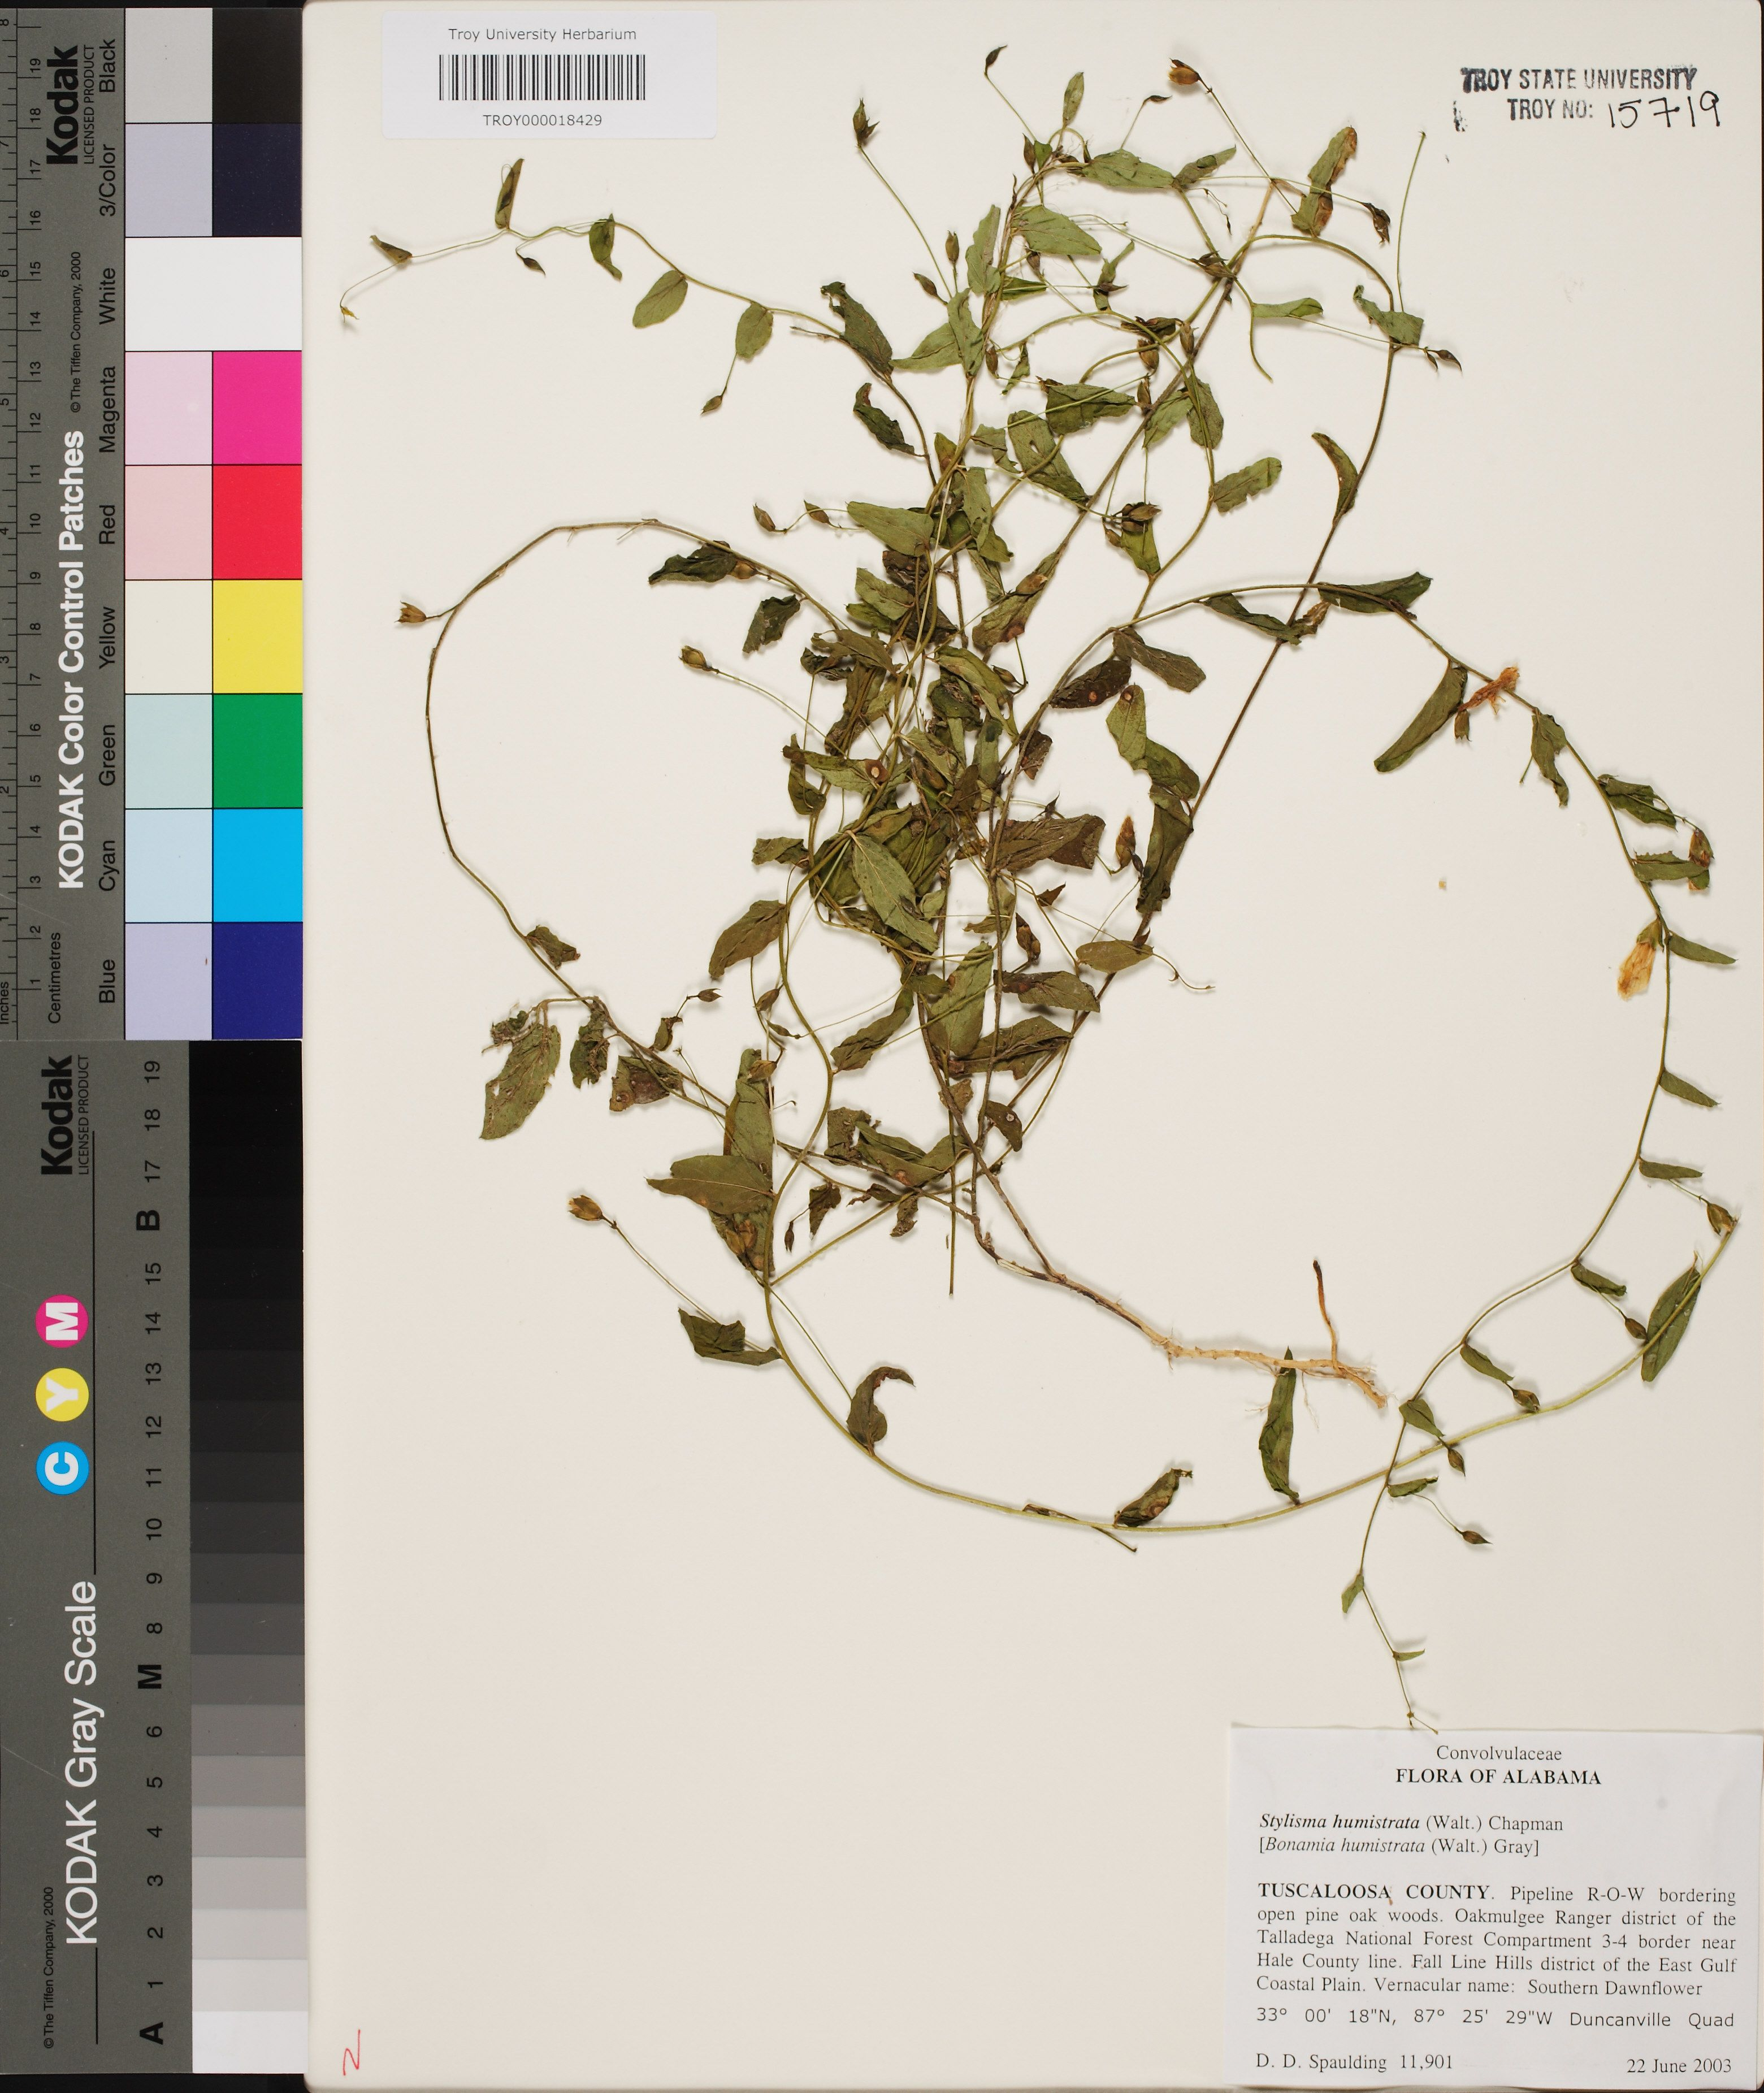 Alabama tuscaloosa county duncanville - 11901 Troy Stylisma Humistrata Walter Chapman